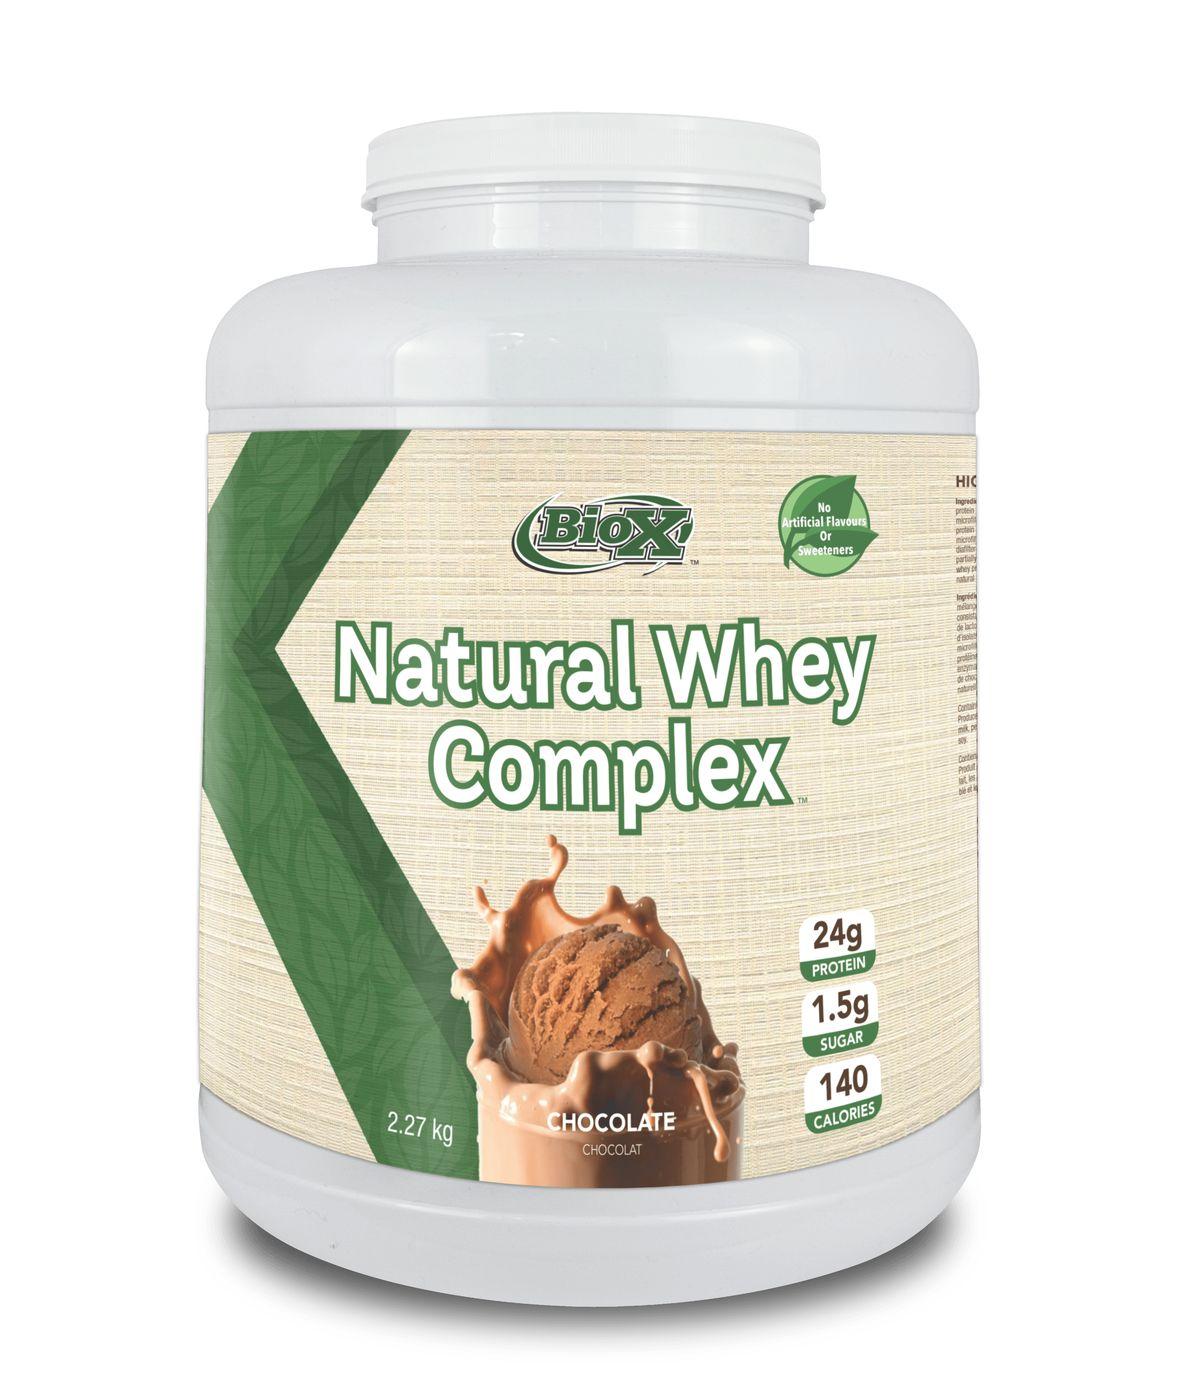 biox-natural-whey-complex-3